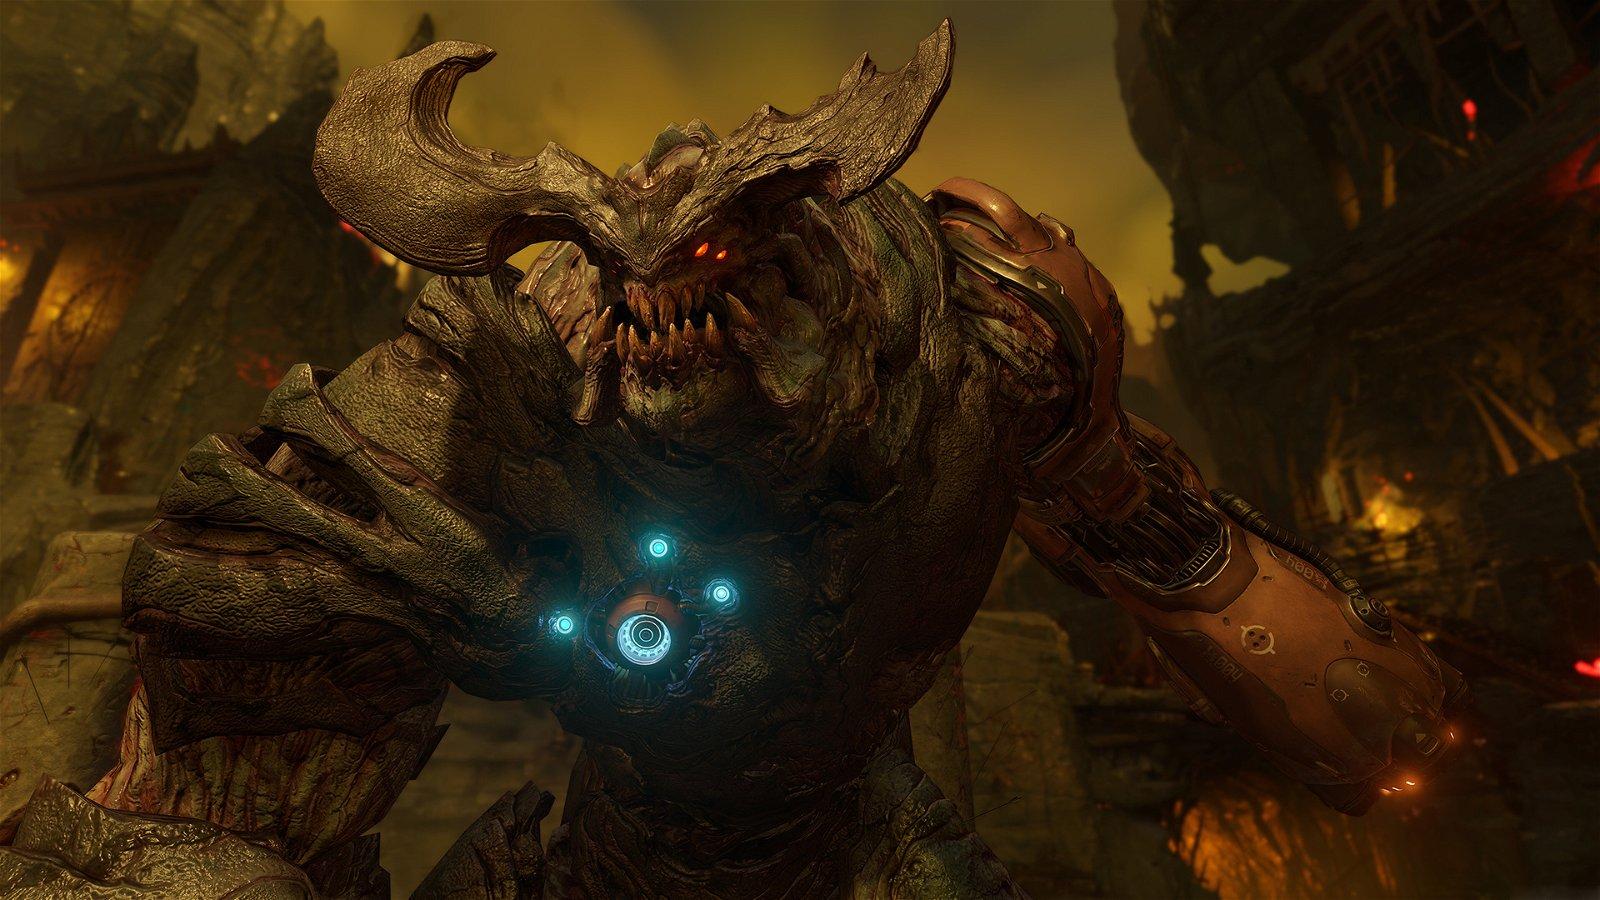 New Screenshots From Doom - 2015-07-24 12:44:52